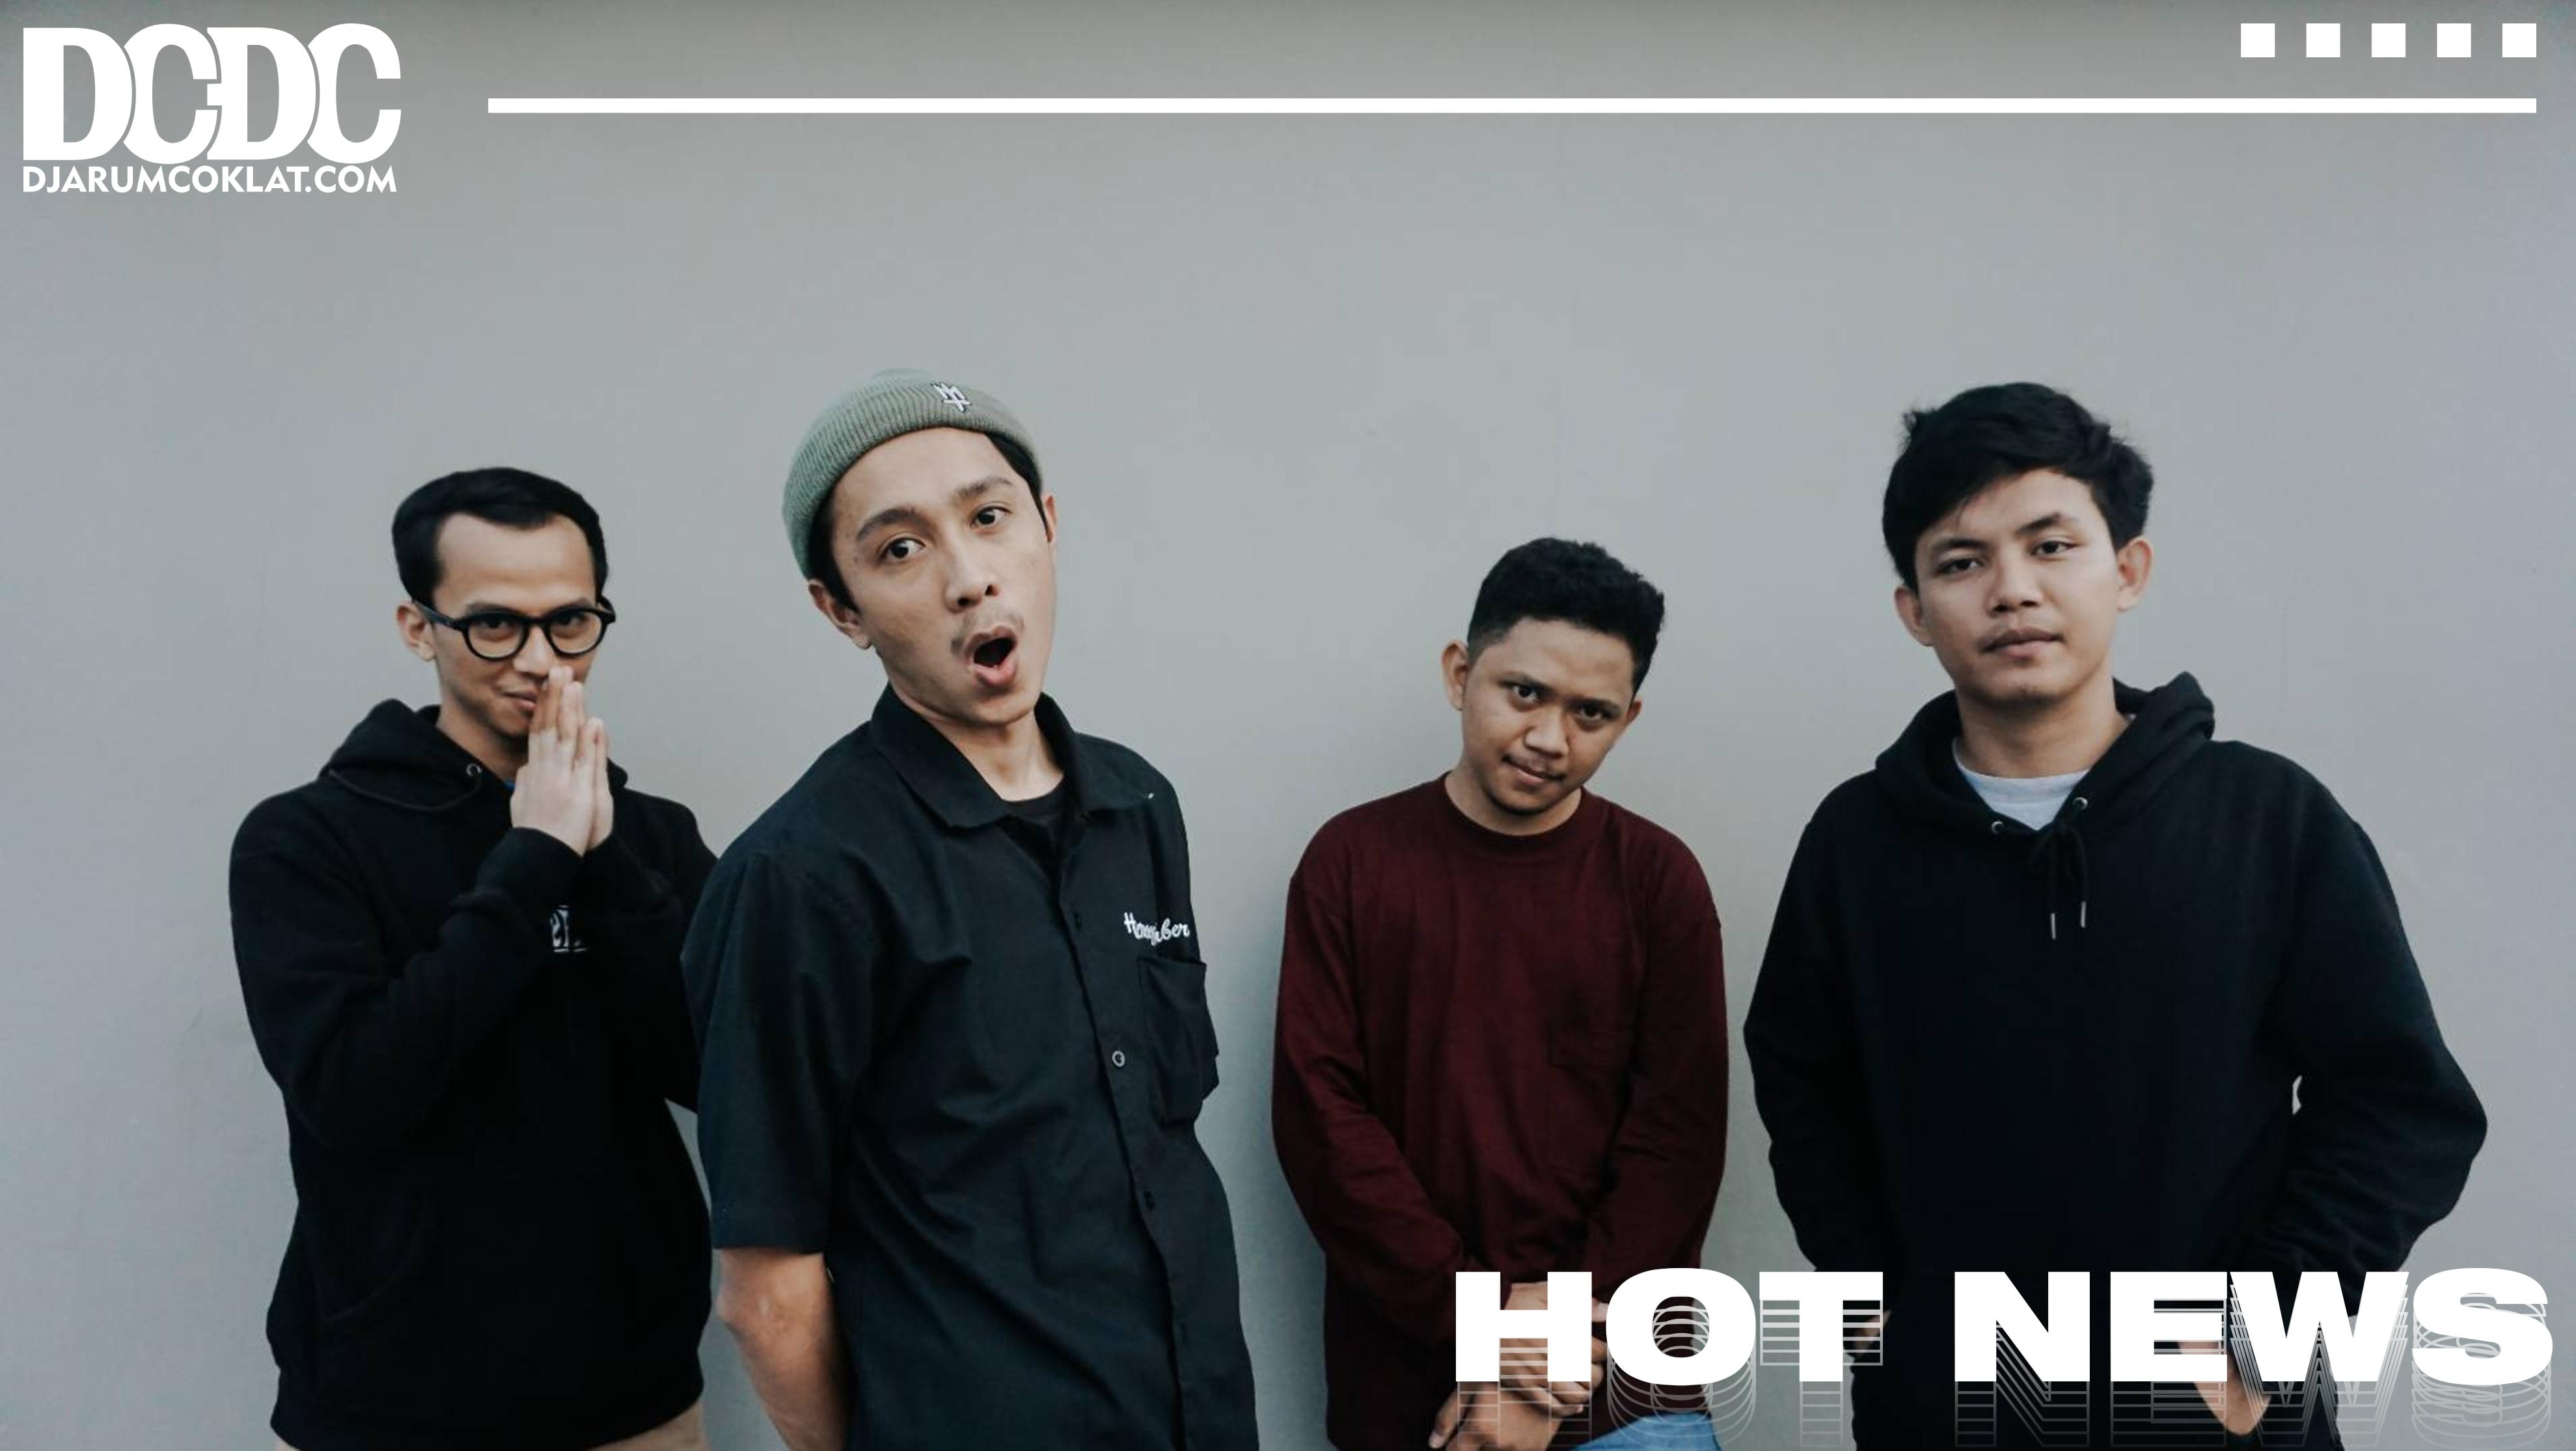 SAILY Angkat Kisah 'Toxic Relationship' di Lagu Barunya